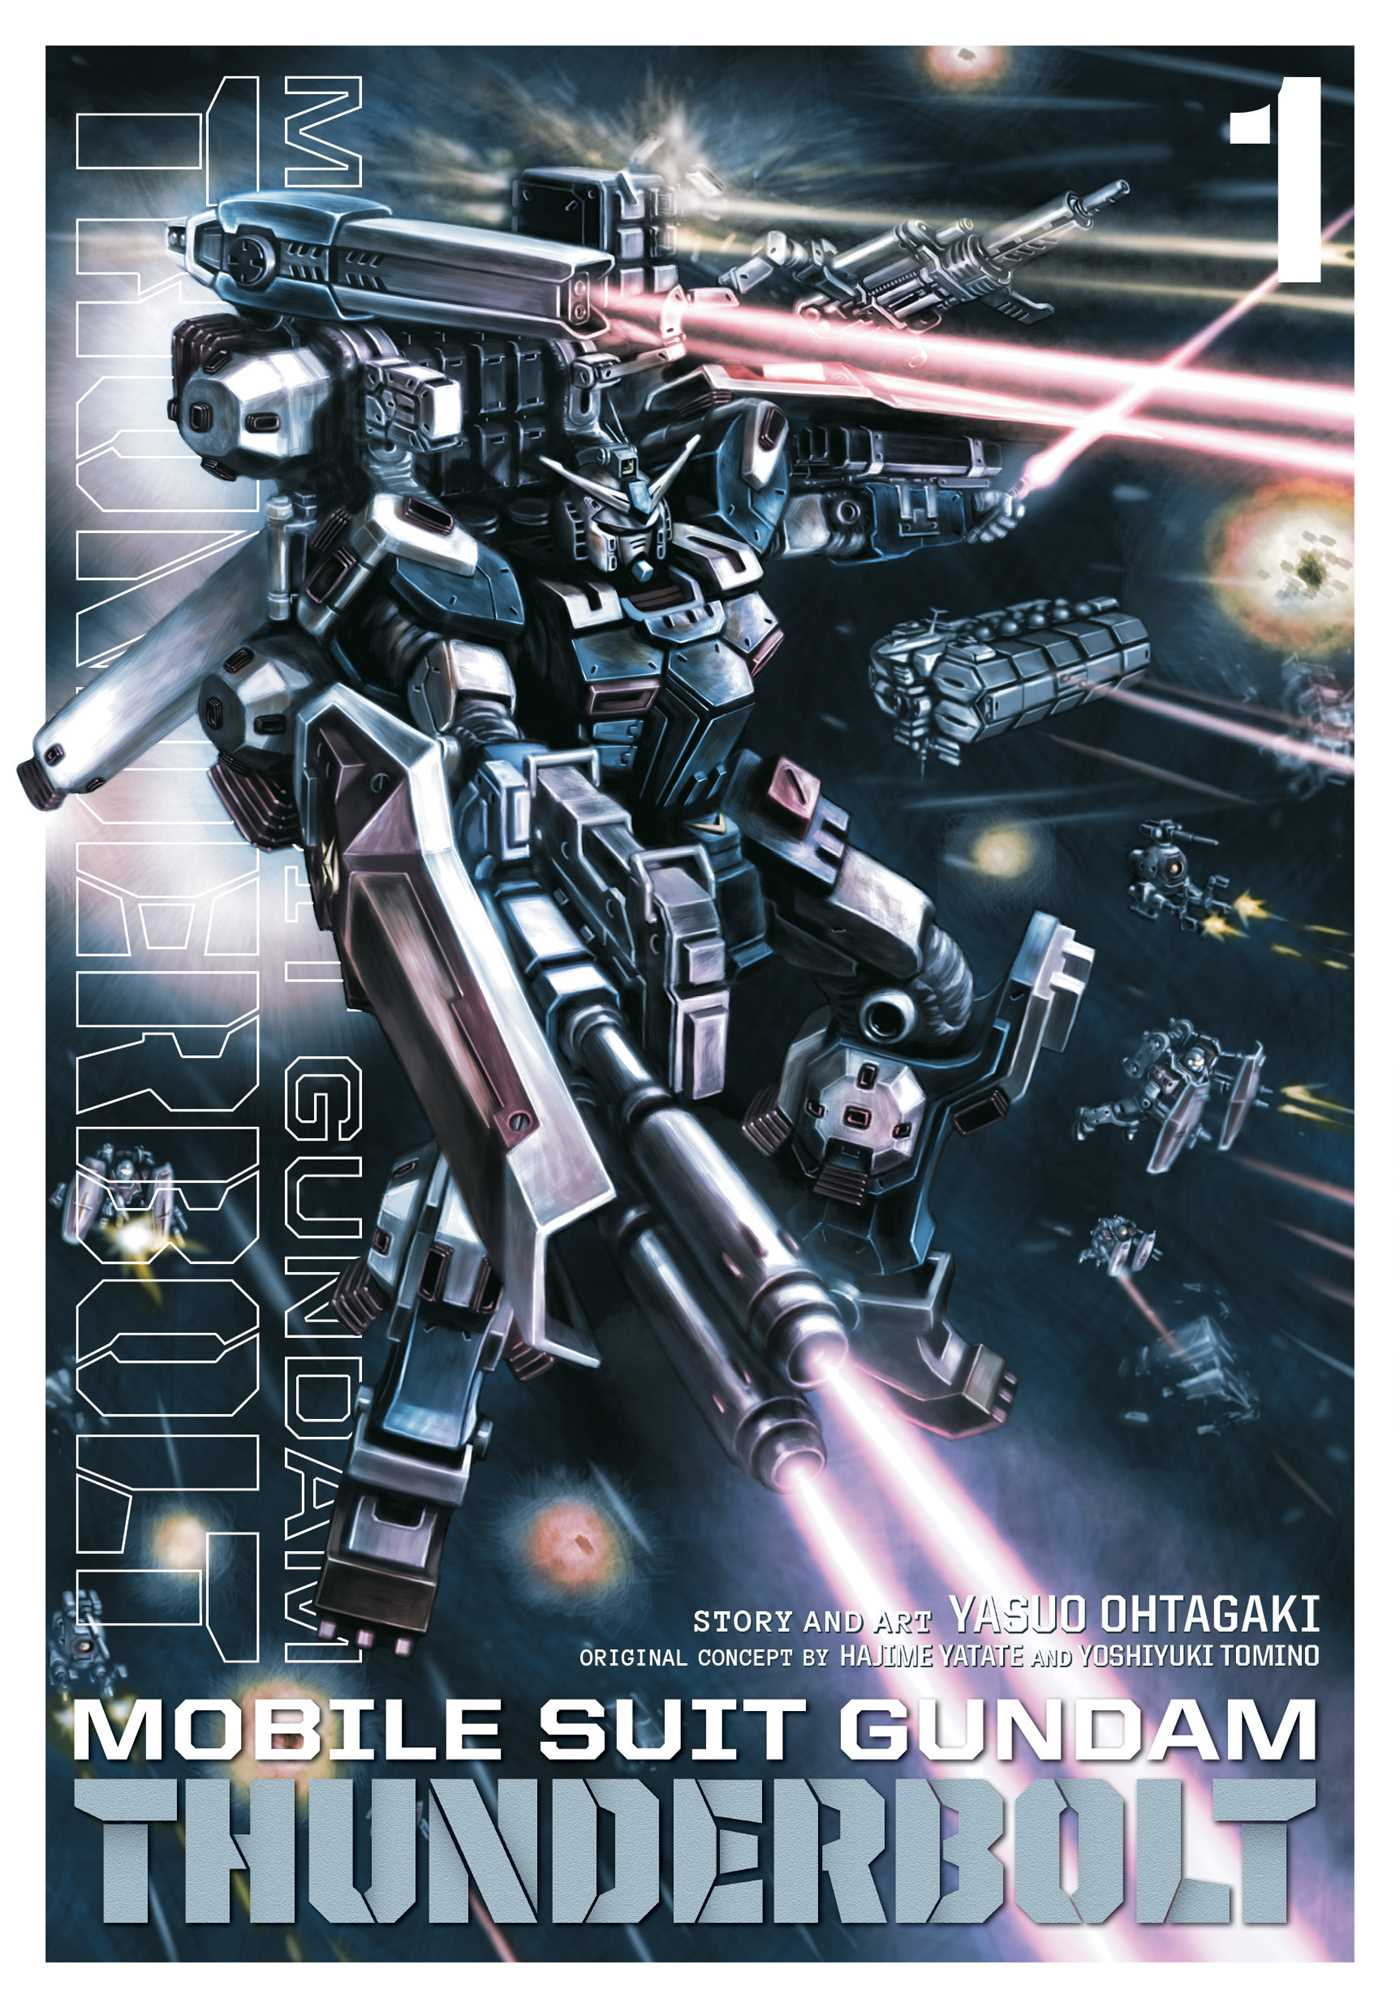 Manga_Mobile_Suit_Gundam_Thunderbolt_entra_em_hiato